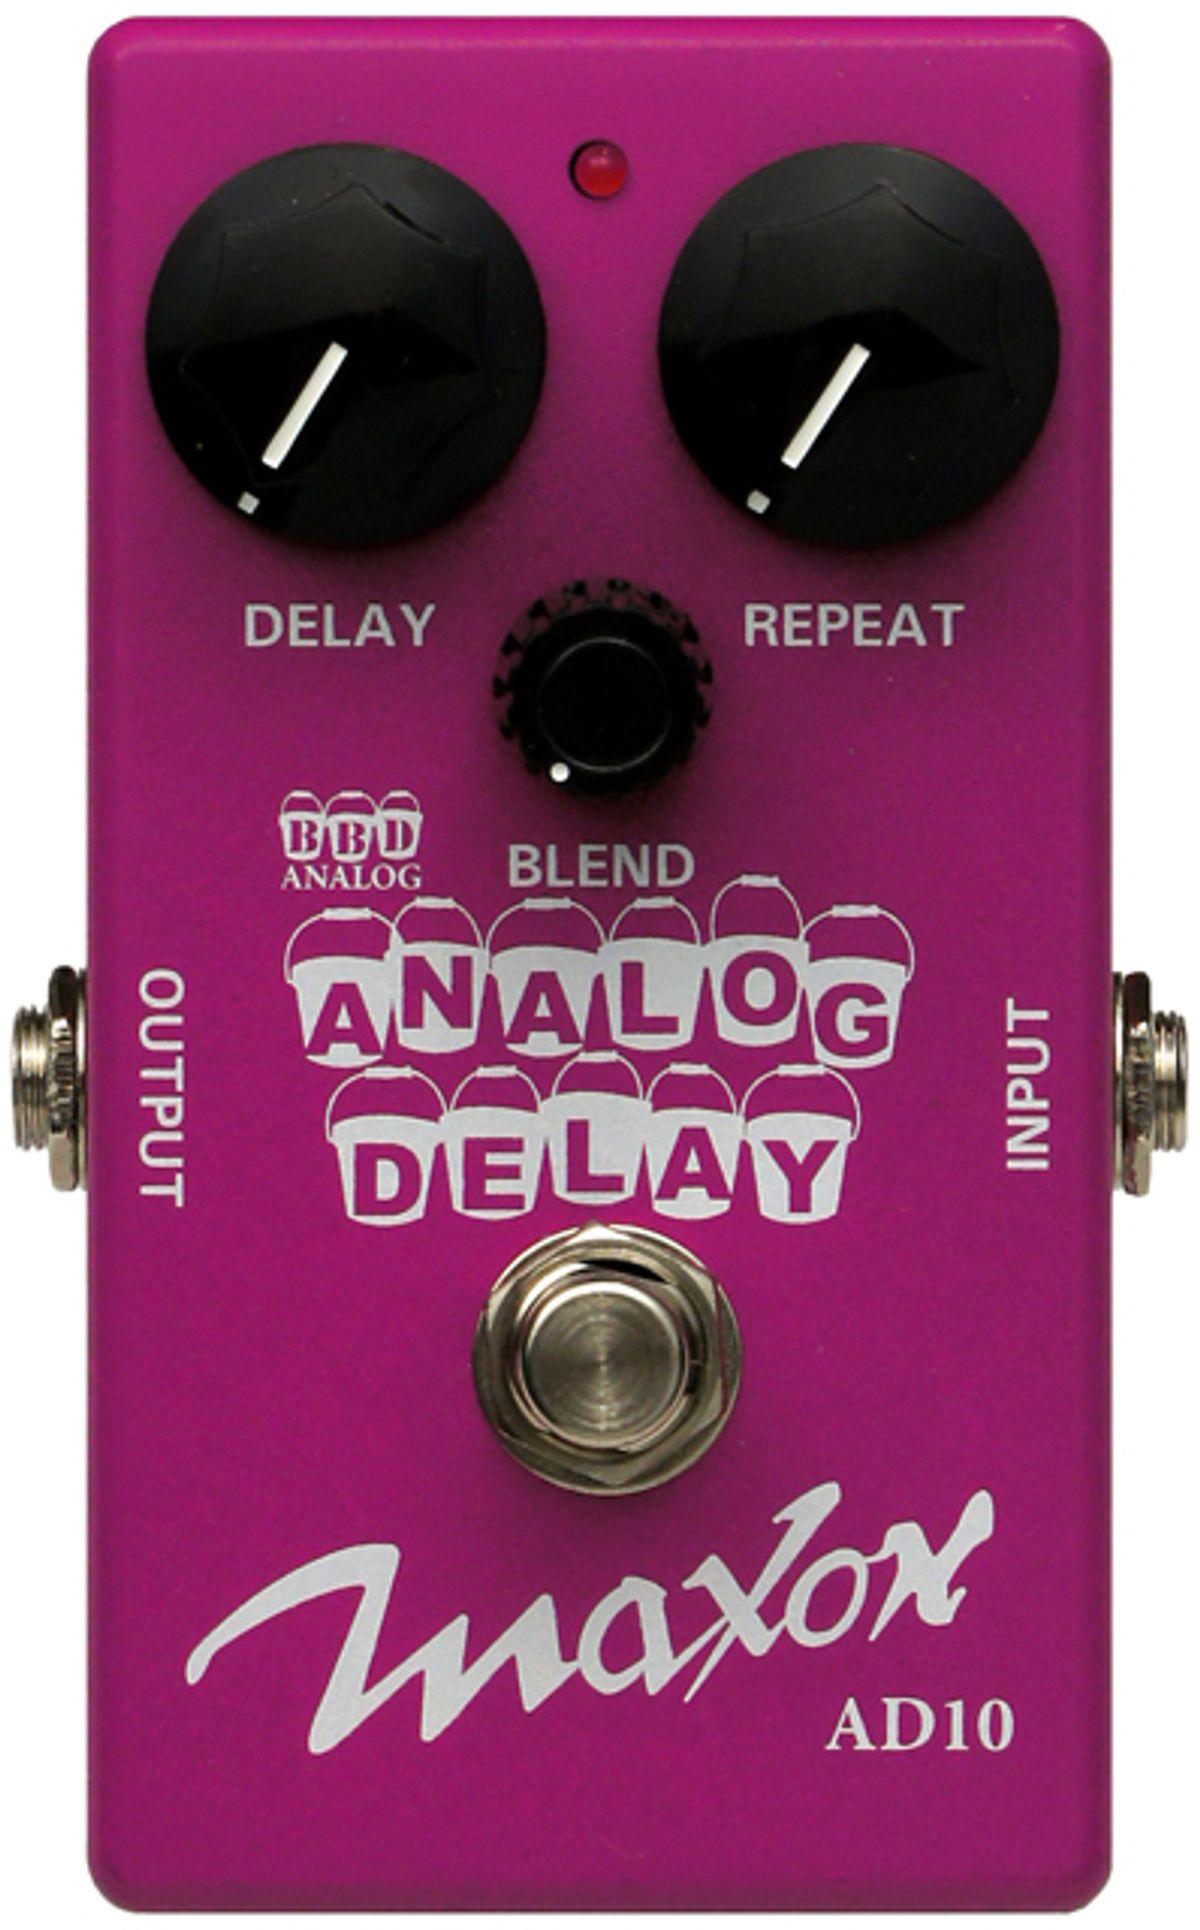 Godlyke Announces Maxon AD10 Analog Delay and ASC10 Ambient Stereo Chorus